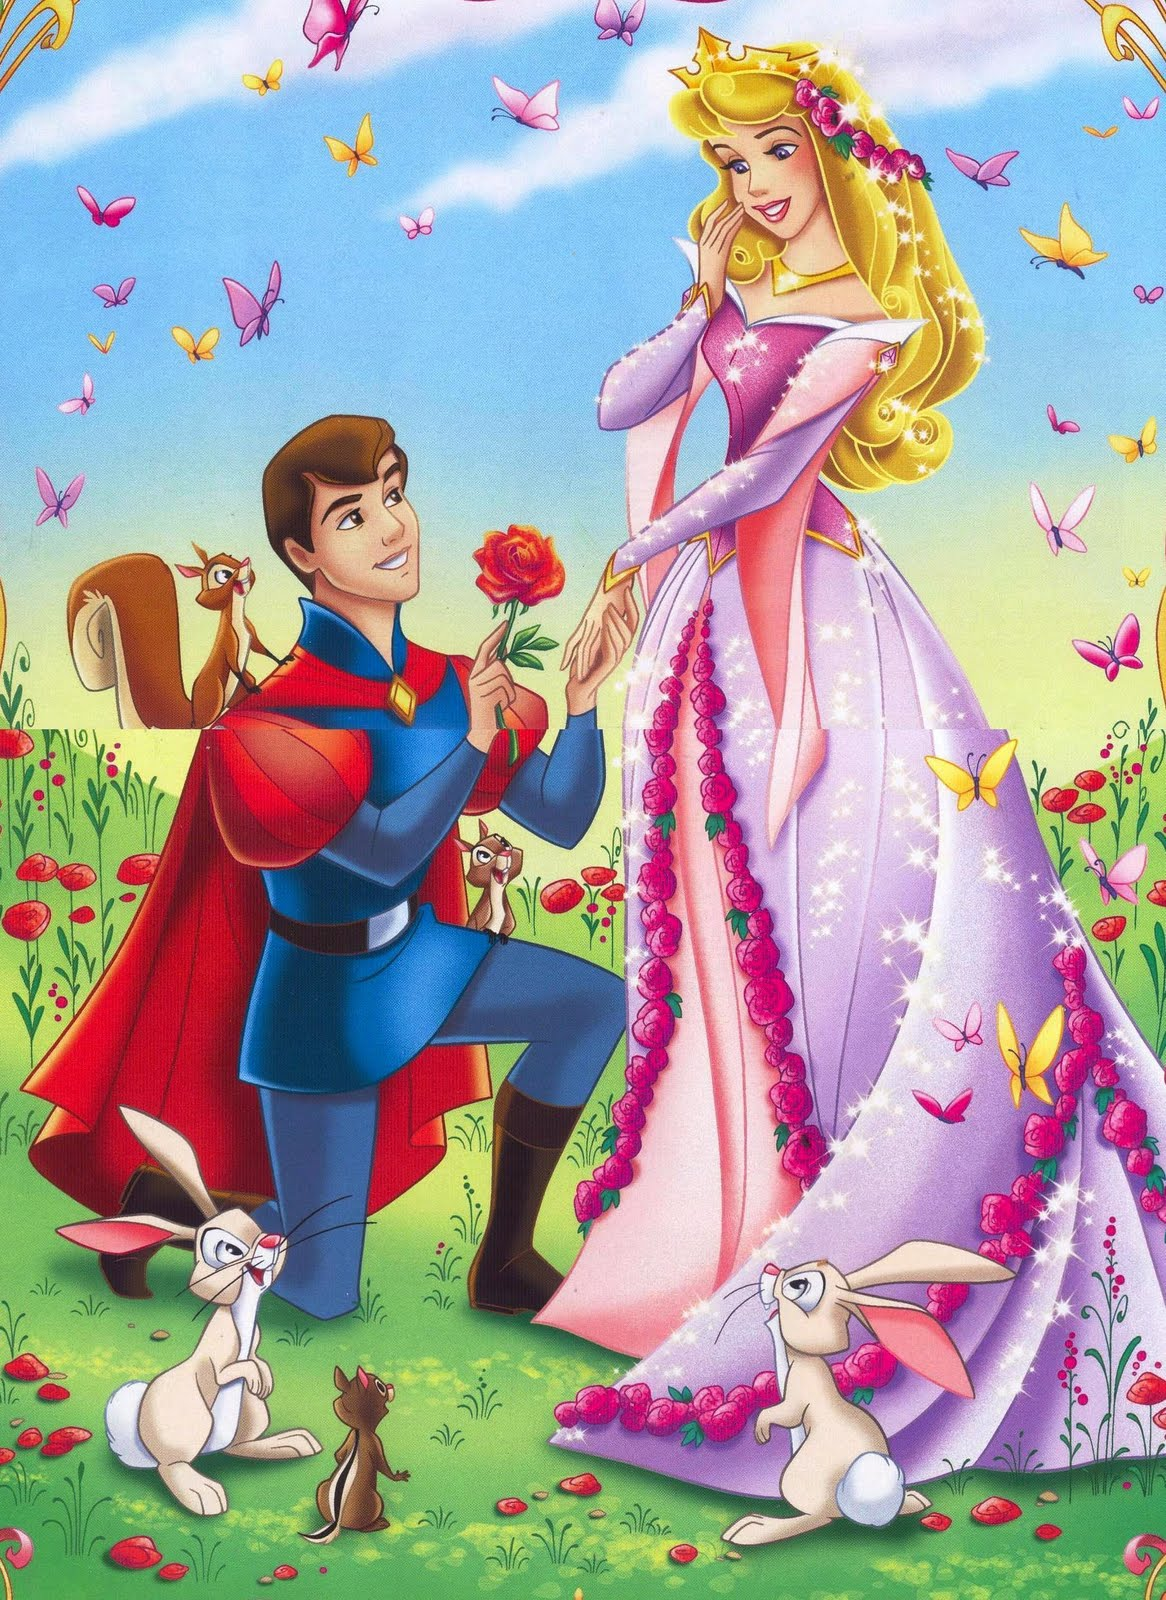 Cartoons|Jasmine|Mario|Super Man|Bugs Bunny |Avatar